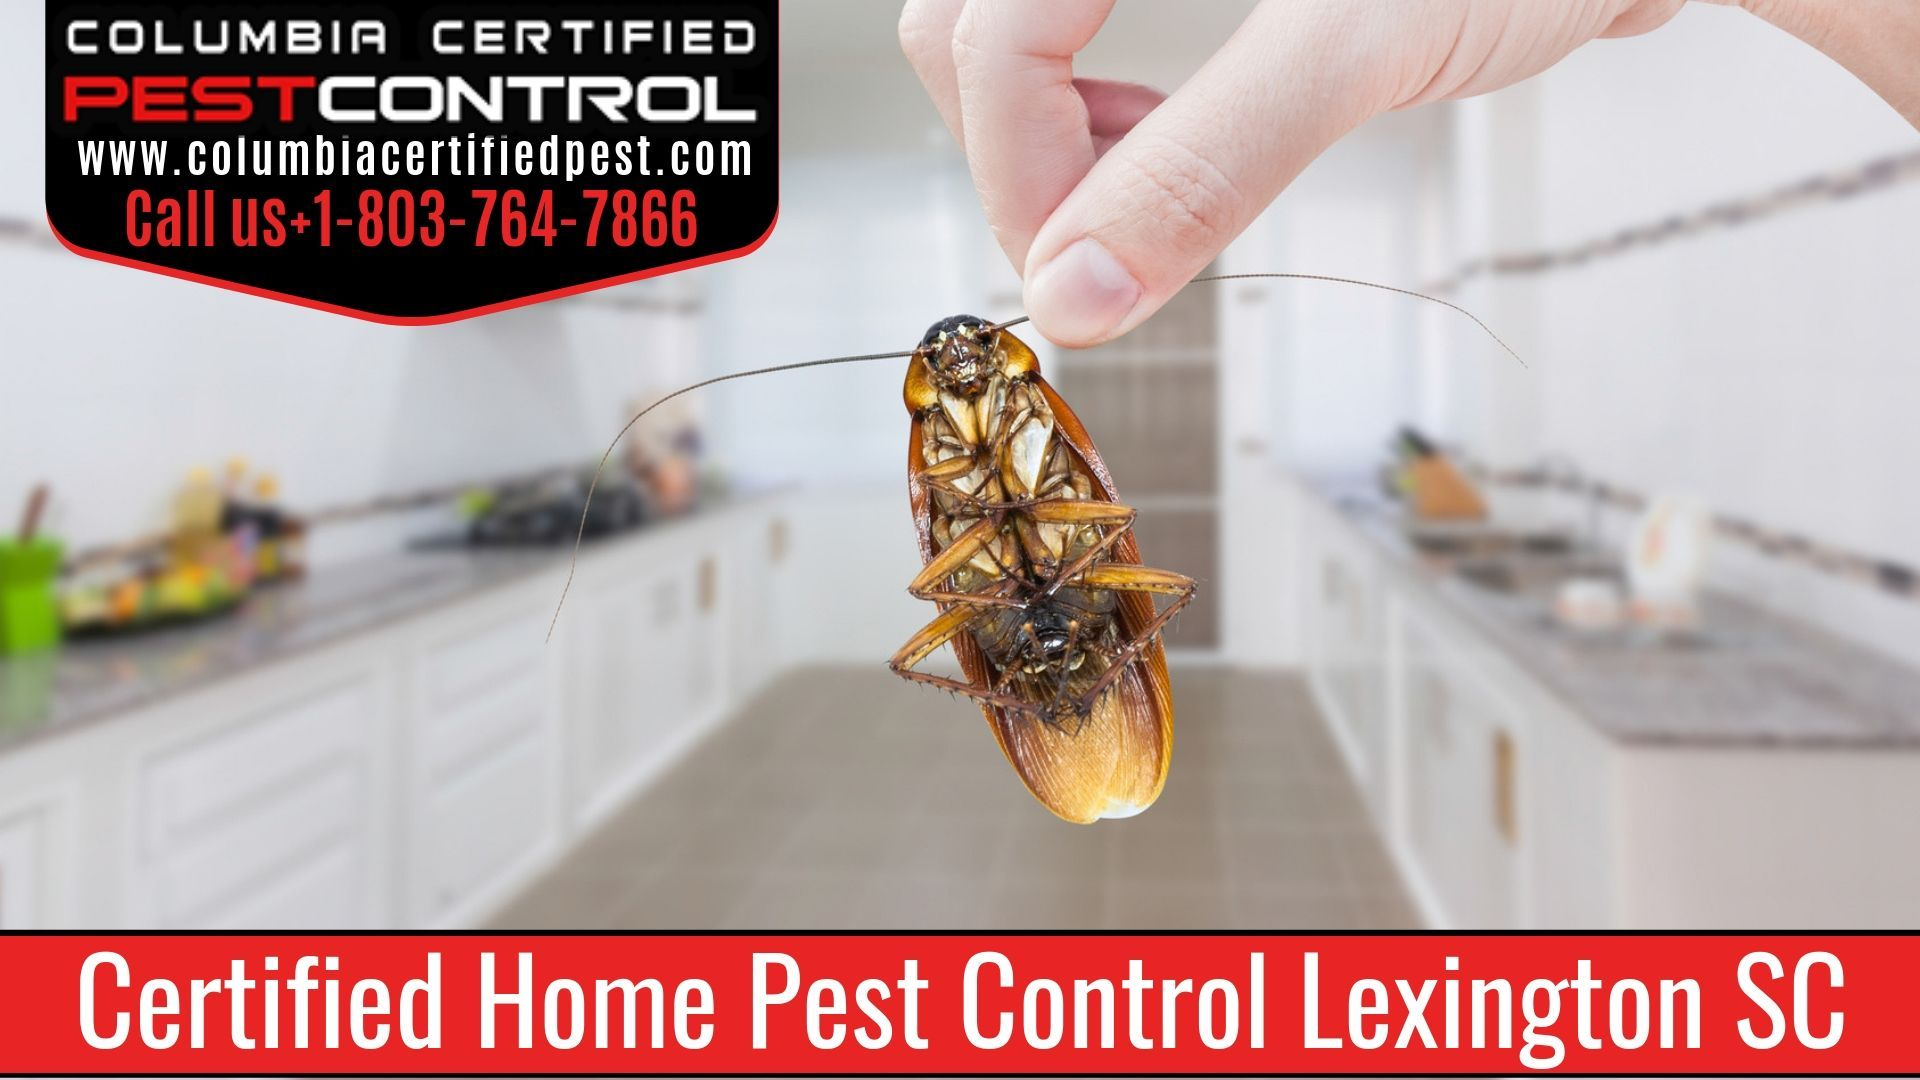 Home Pest Control Columbia Sc Pest Control Services Pest Control Pest Infestation